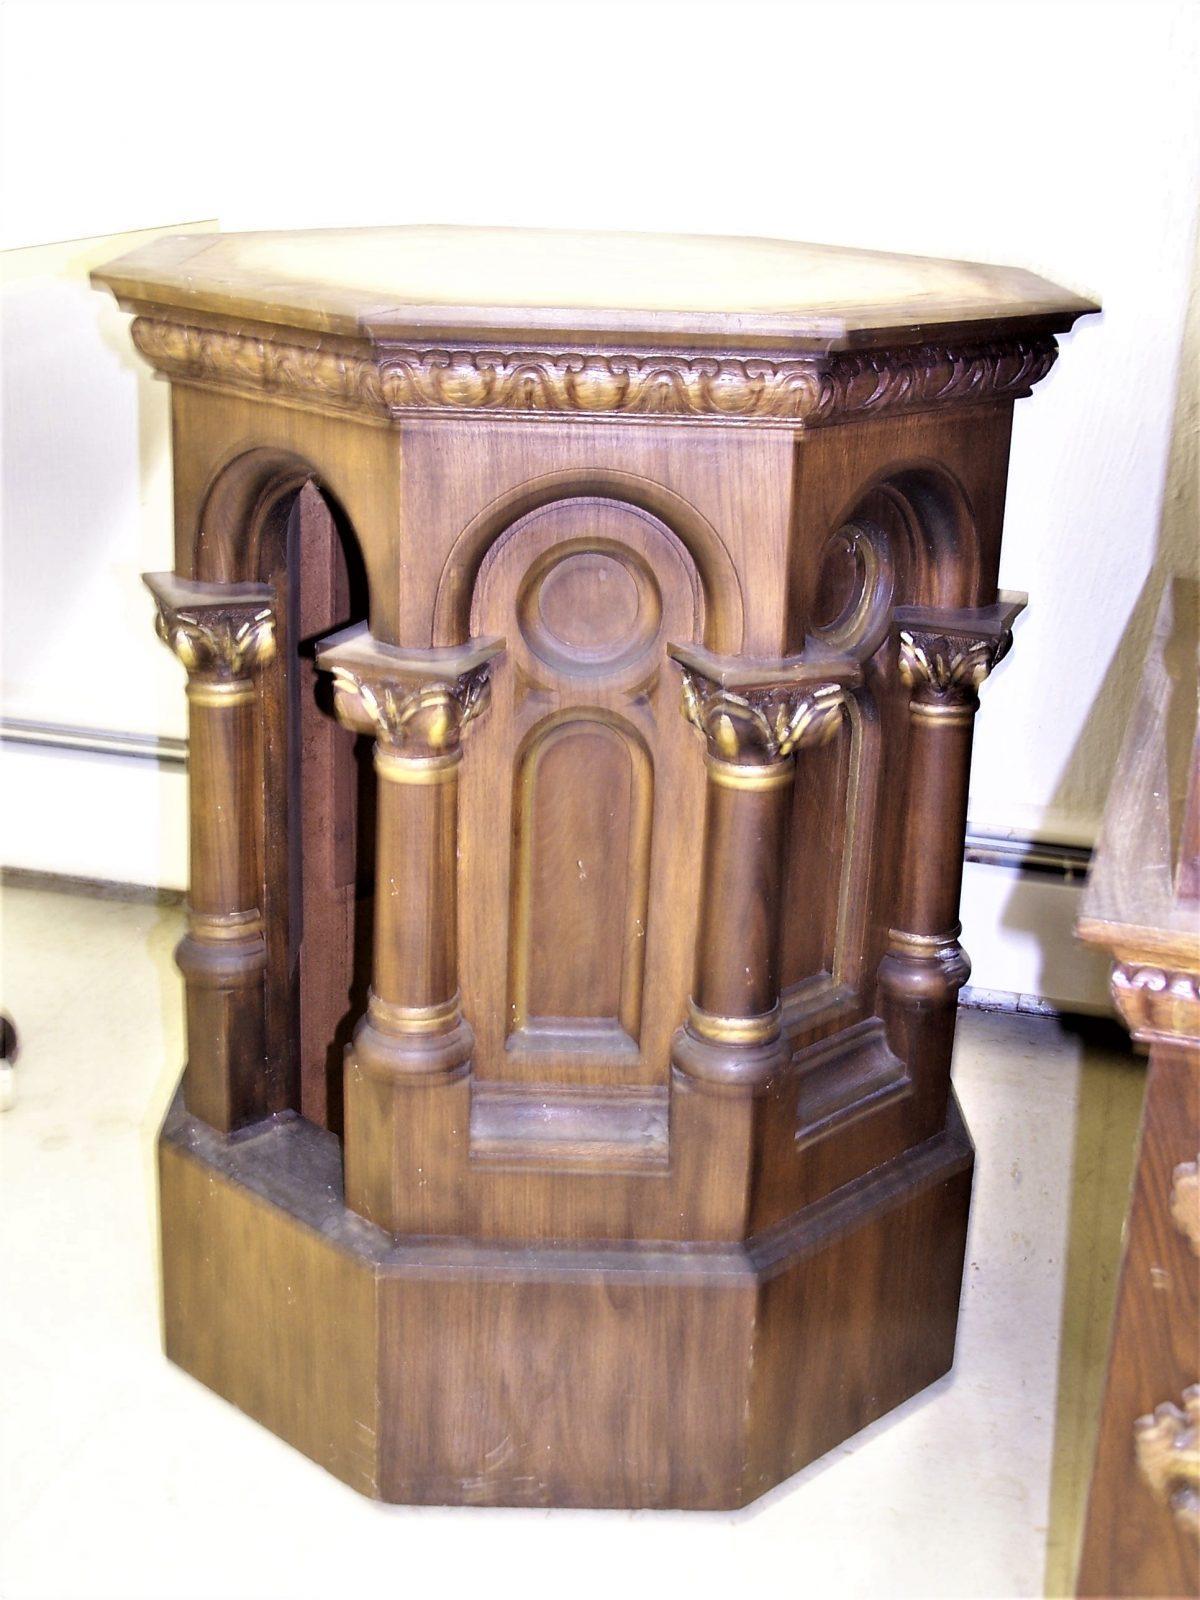 wood altar refinishing, pew refinishing